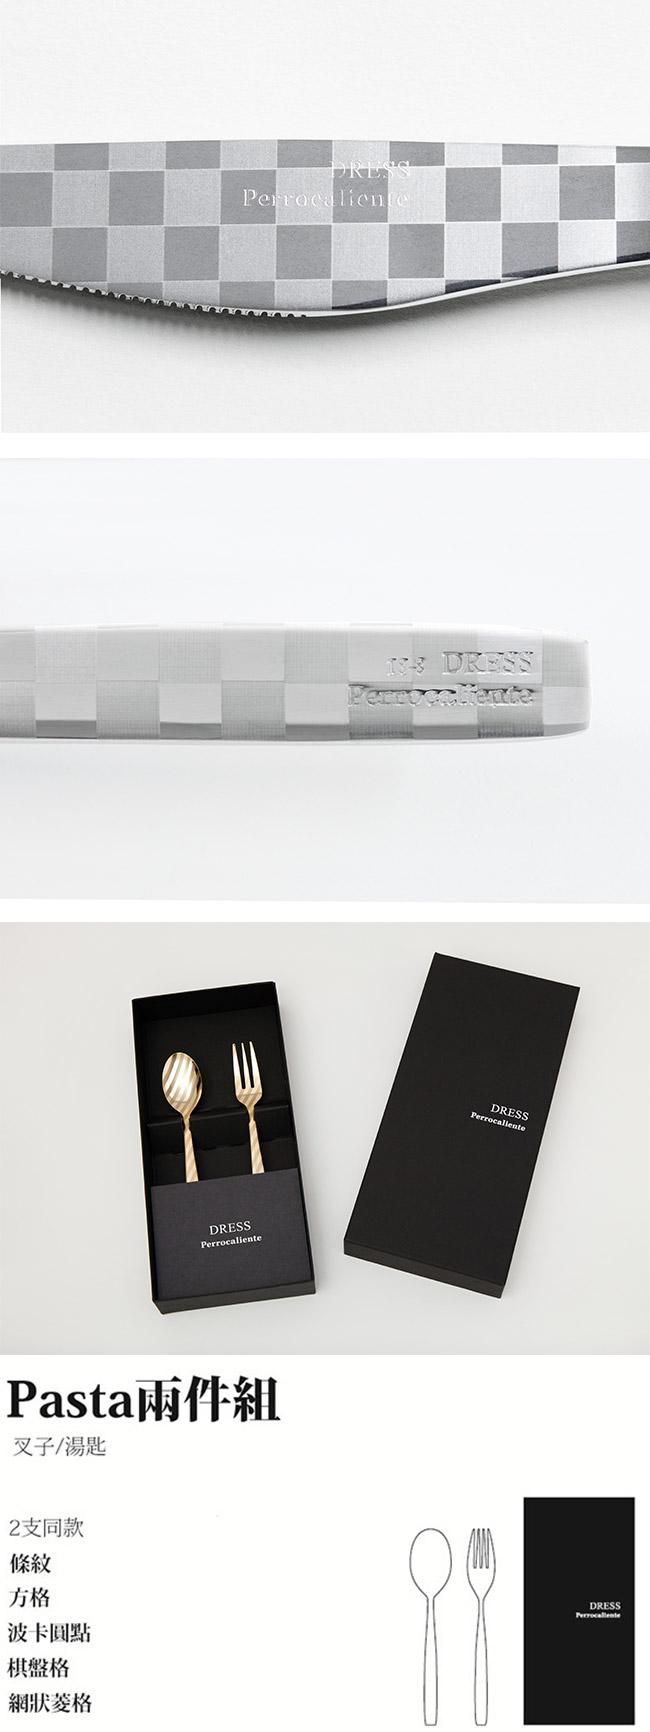 Perrocaliente Dress Gift Set 金色盒裝餐具組 點心匙&叉兩件組 棋盤格